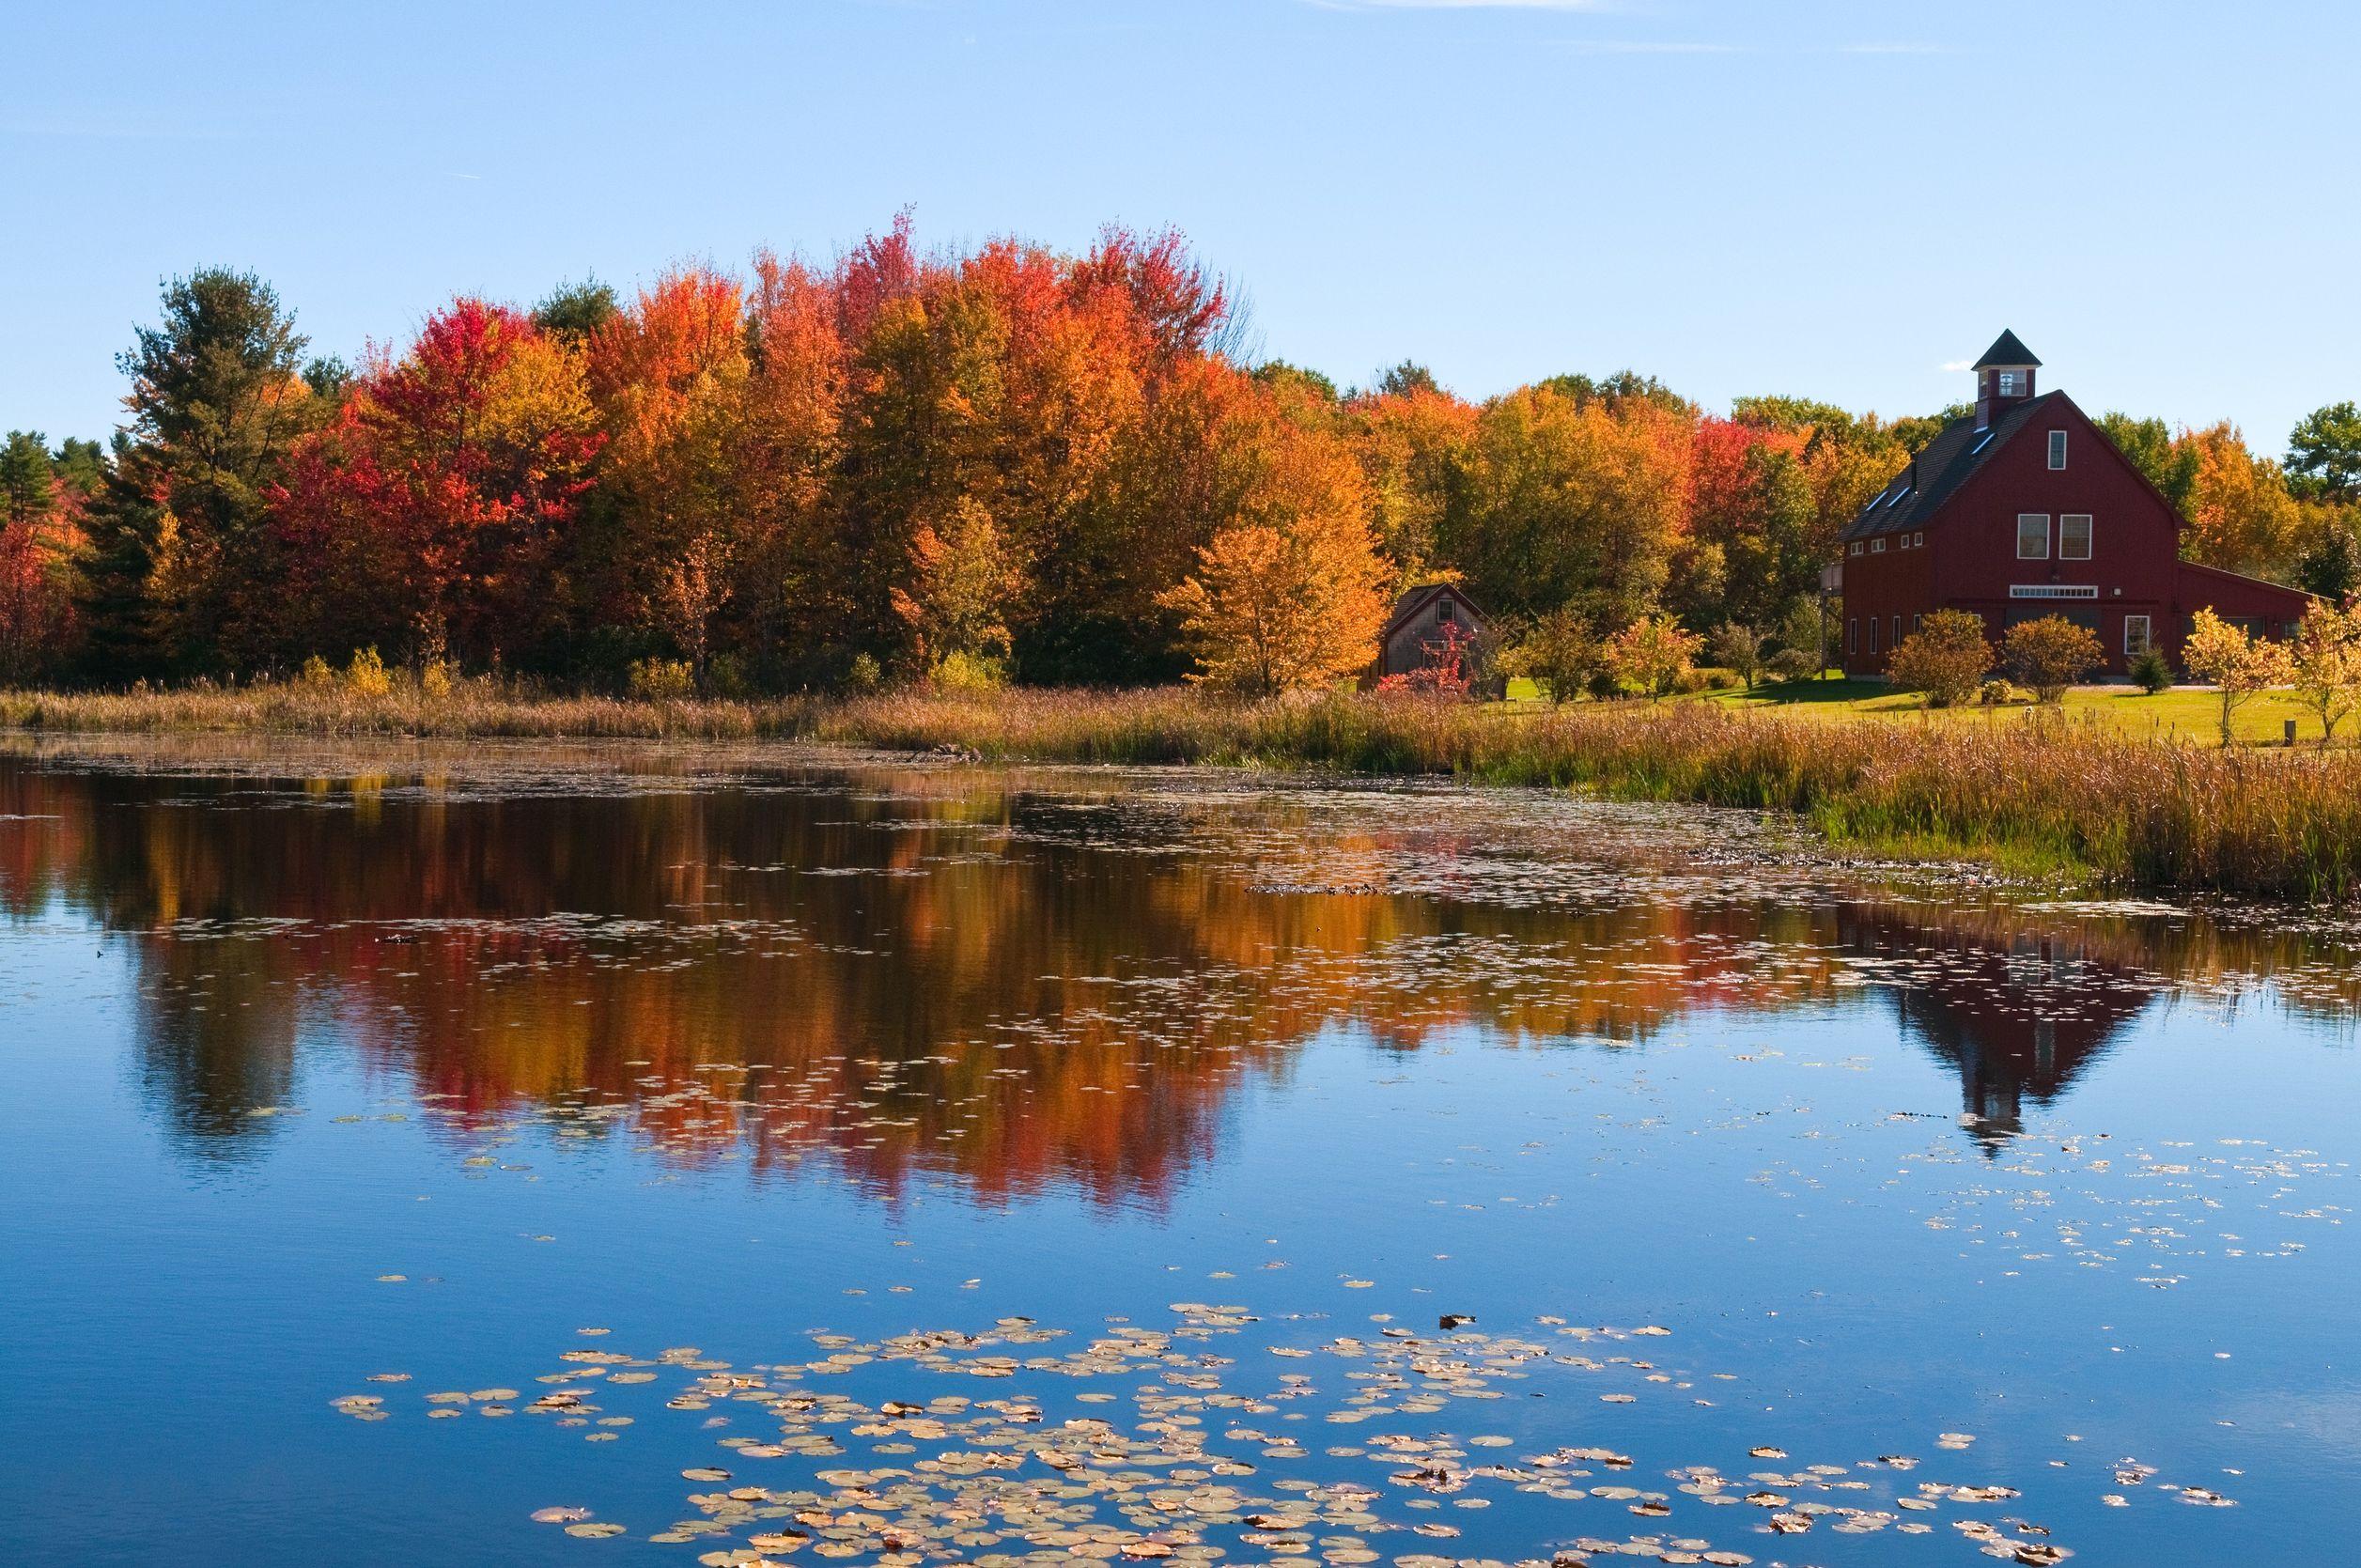 Fall foliage near a pond in Dunbarton, New Hampshire